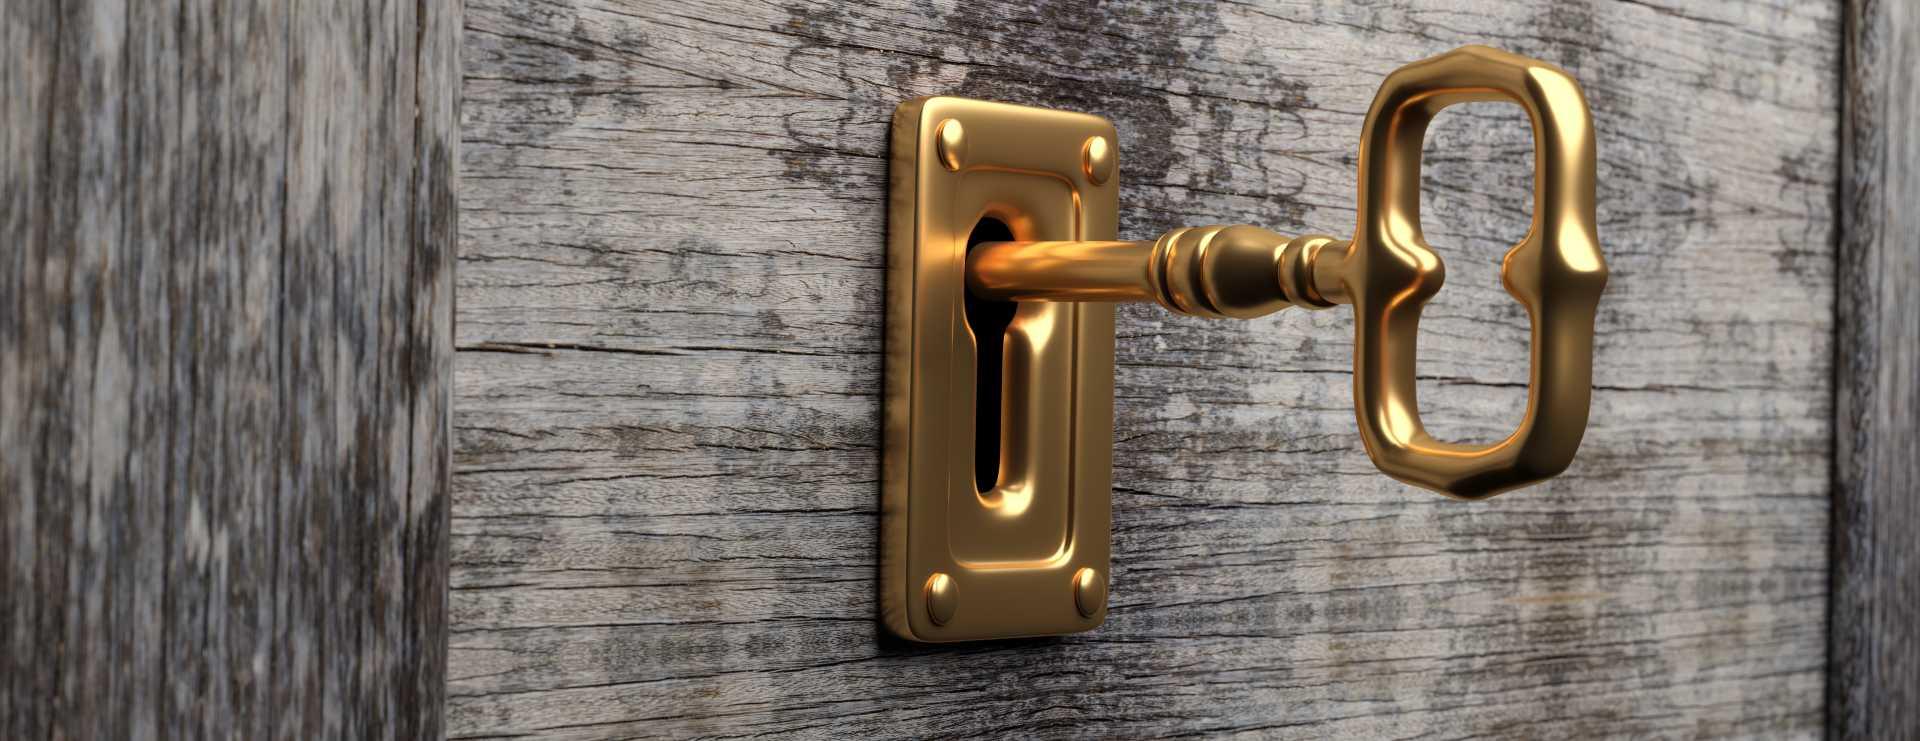 locksmith service in detroit area